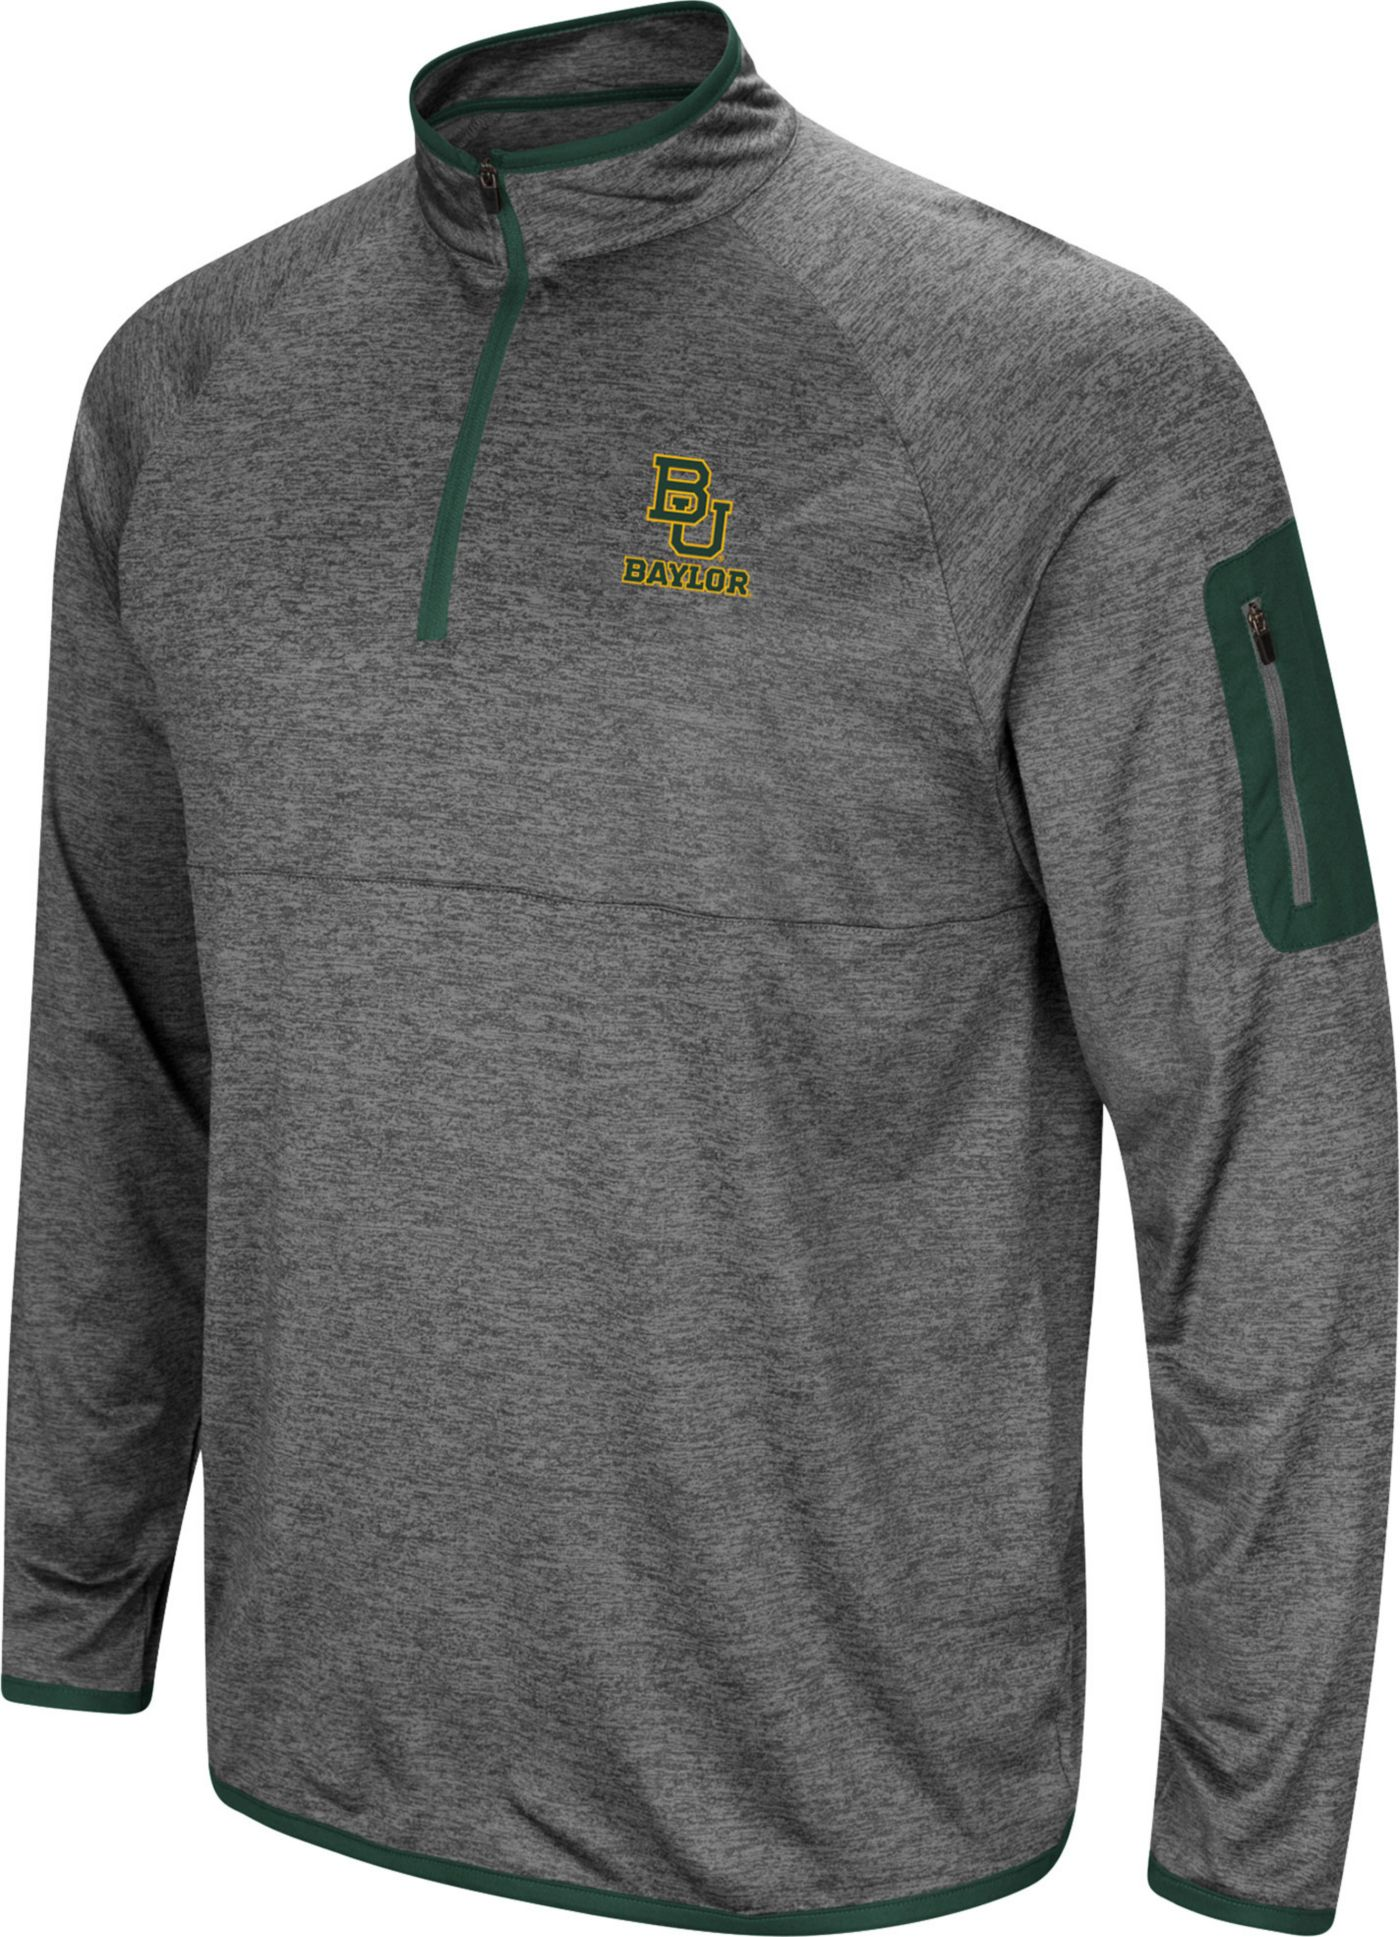 Colosseum Men's Baylor Bears Grey Indus River Quarter-Zip Shirt